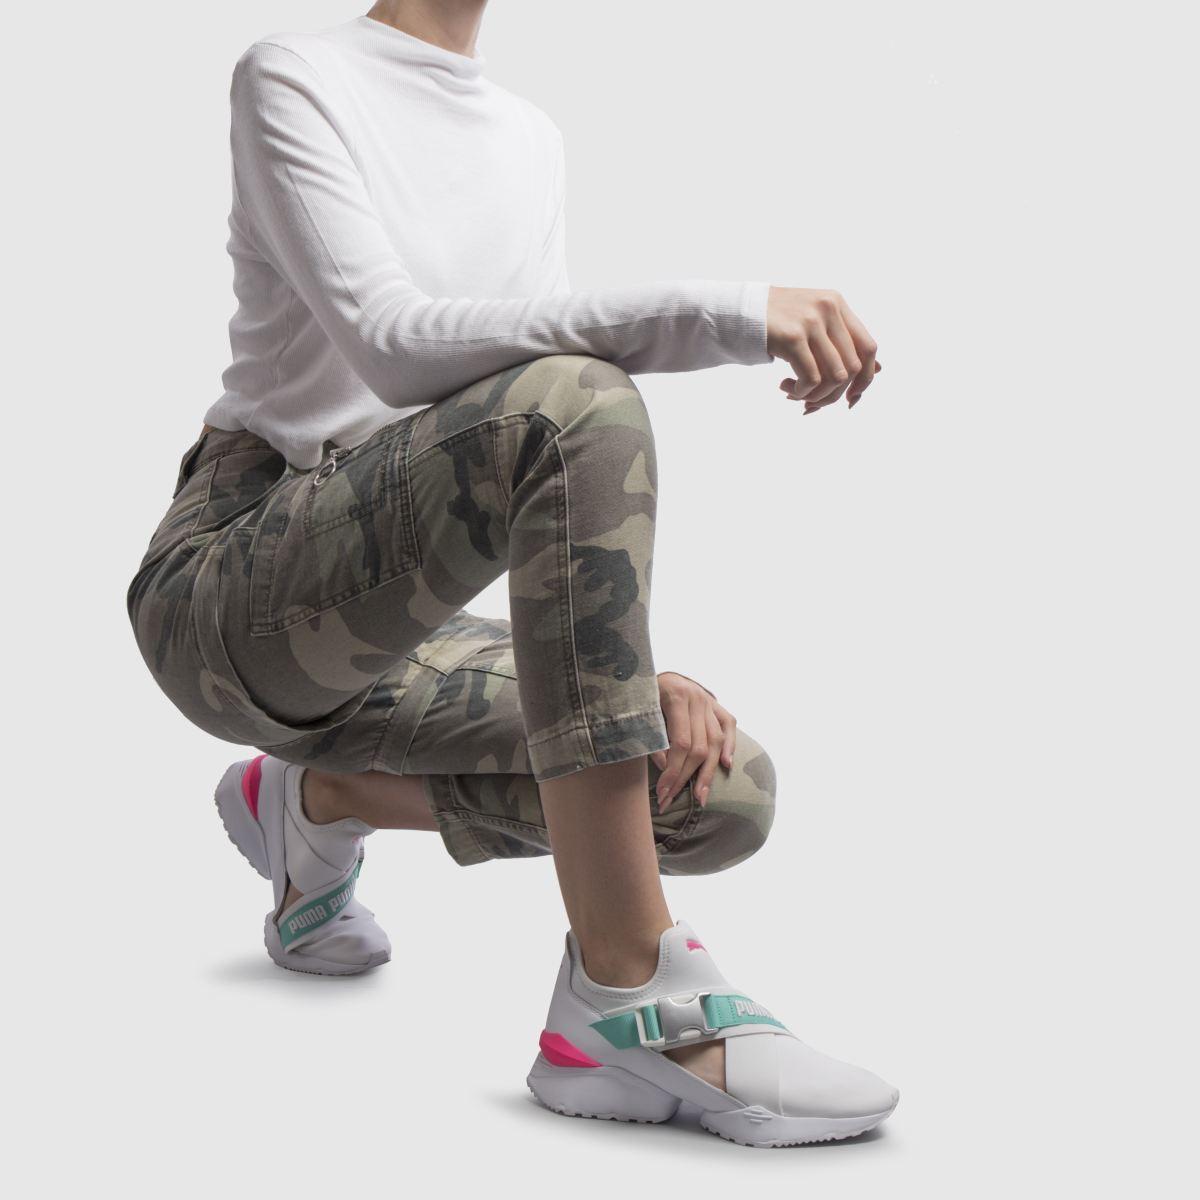 Damen Weiß-pink Gute puma Muse Eso Sneaker | schuh Gute Weiß-pink Qualität beliebte Schuhe e65dc7